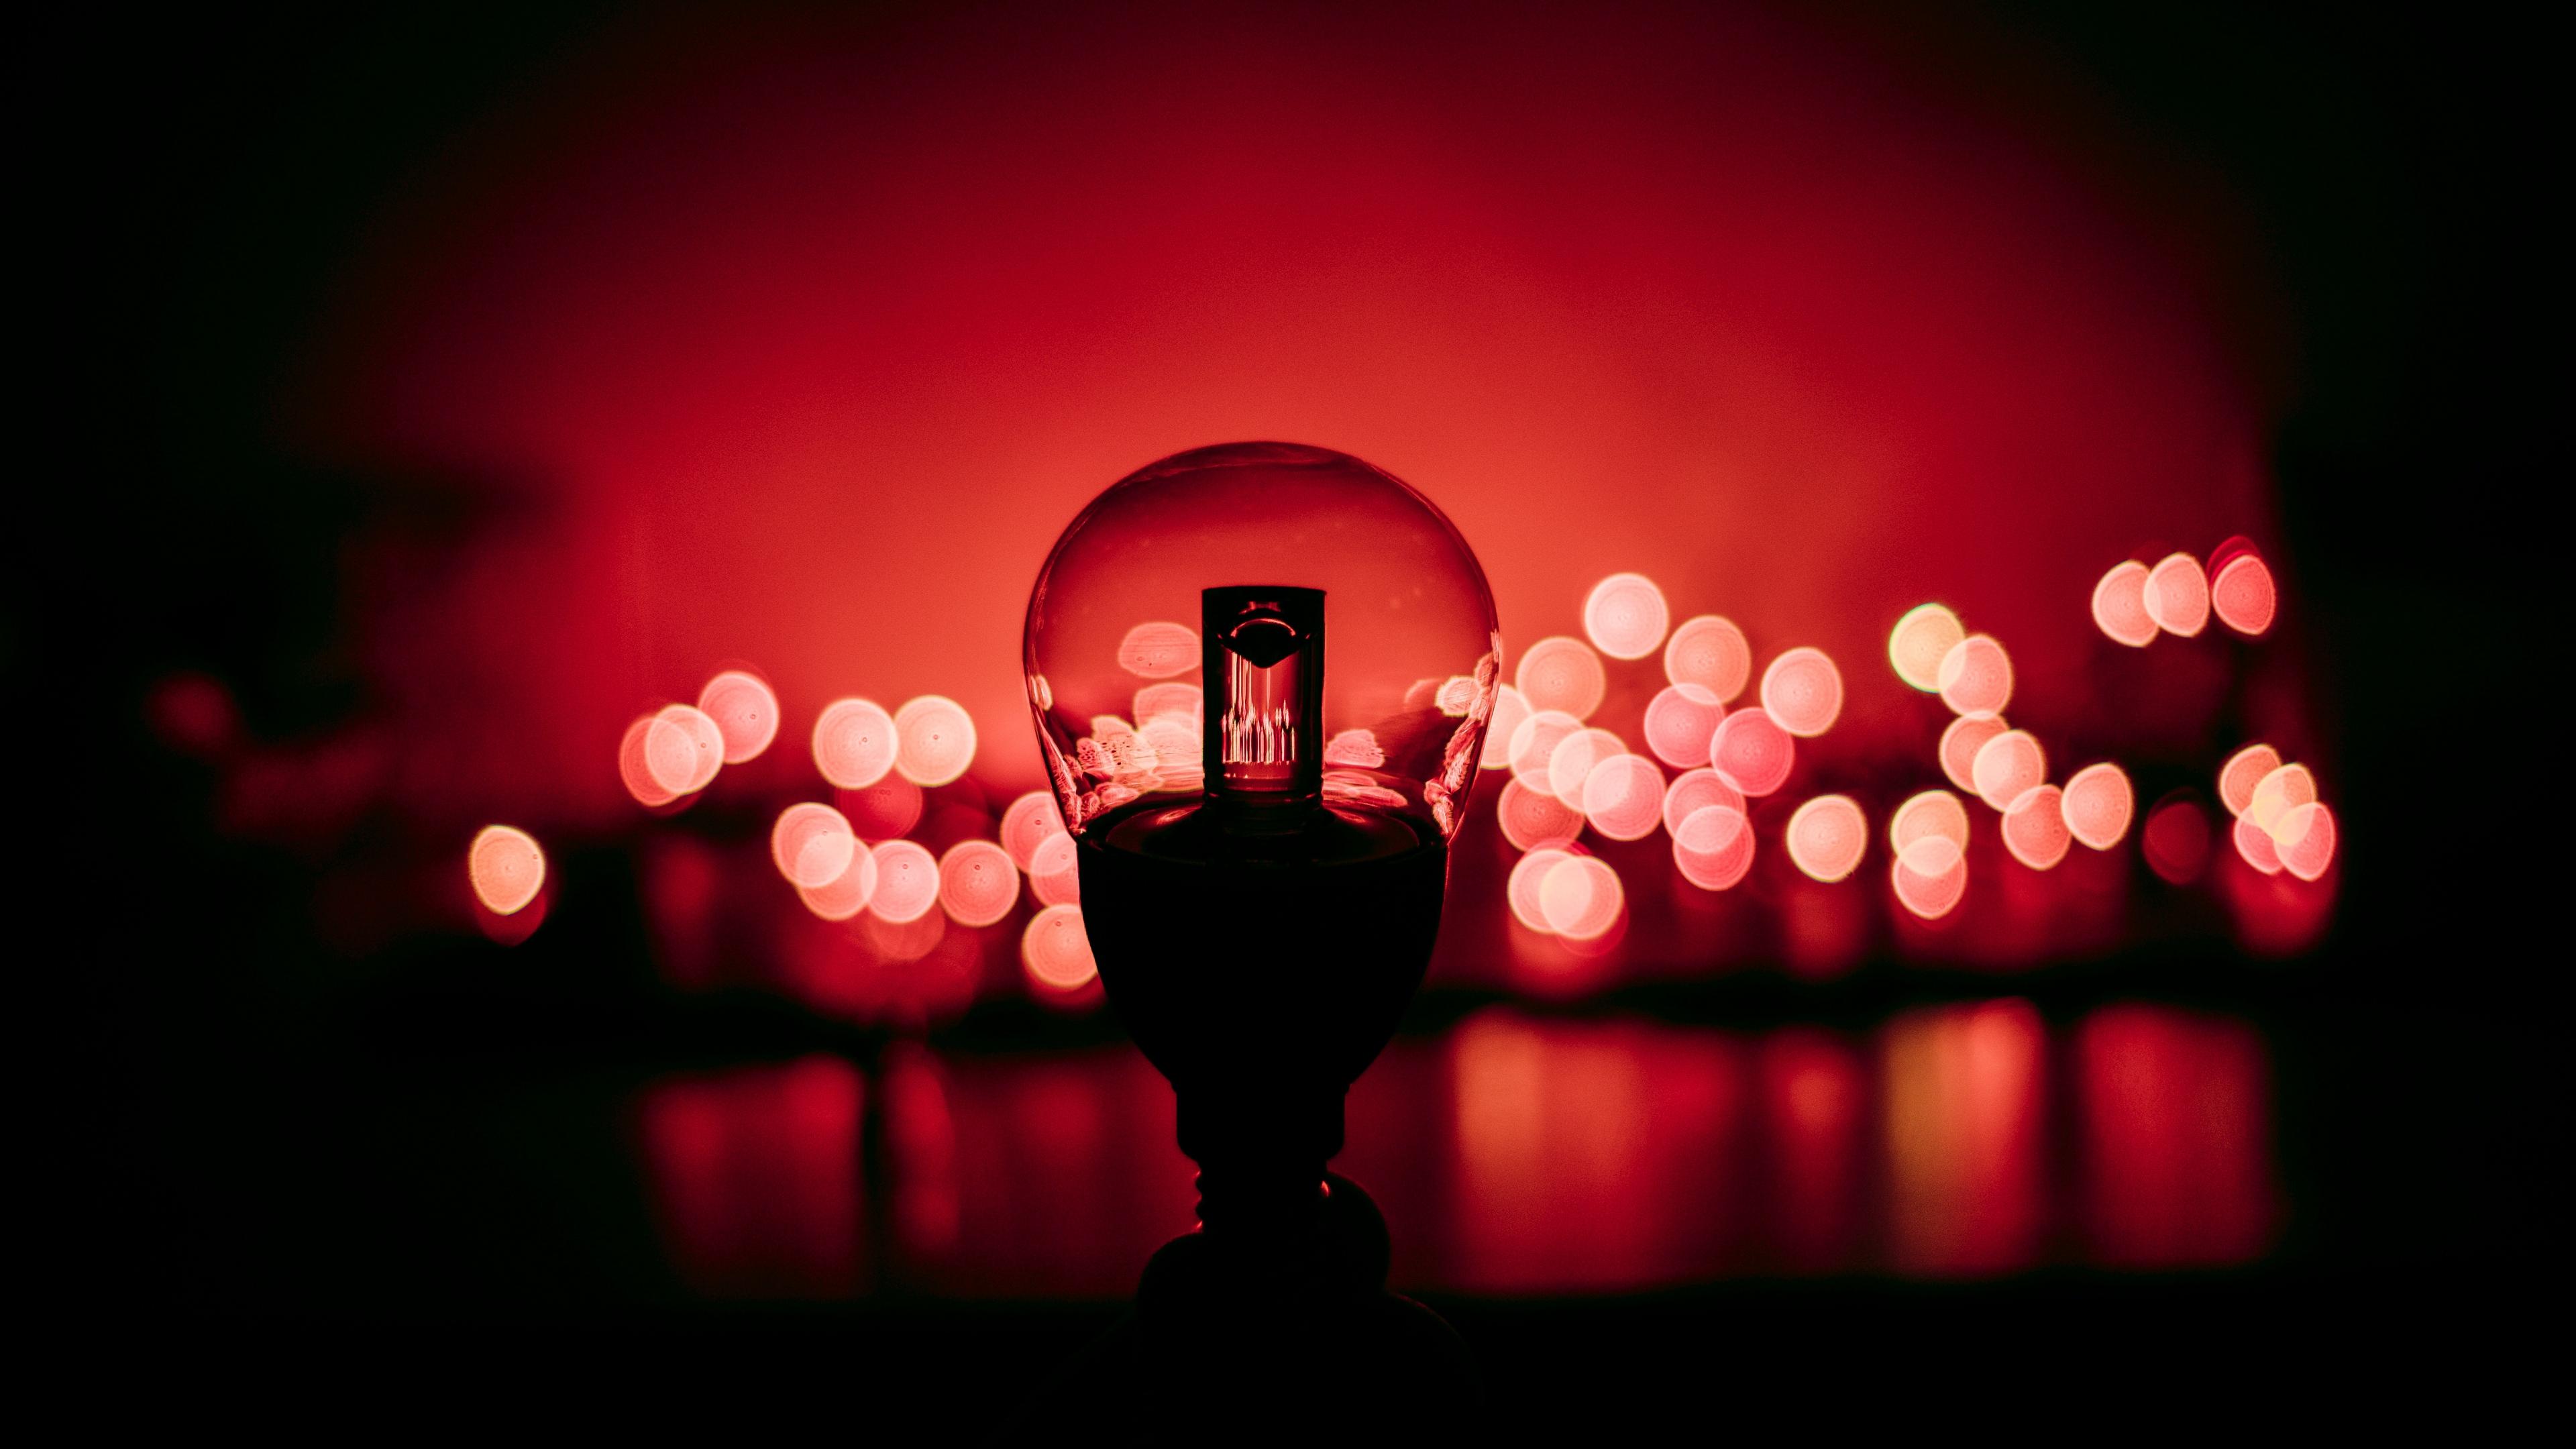 lamp glare red 4k 1540574659 - lamp, glare, red 4k - red, lamp, glare